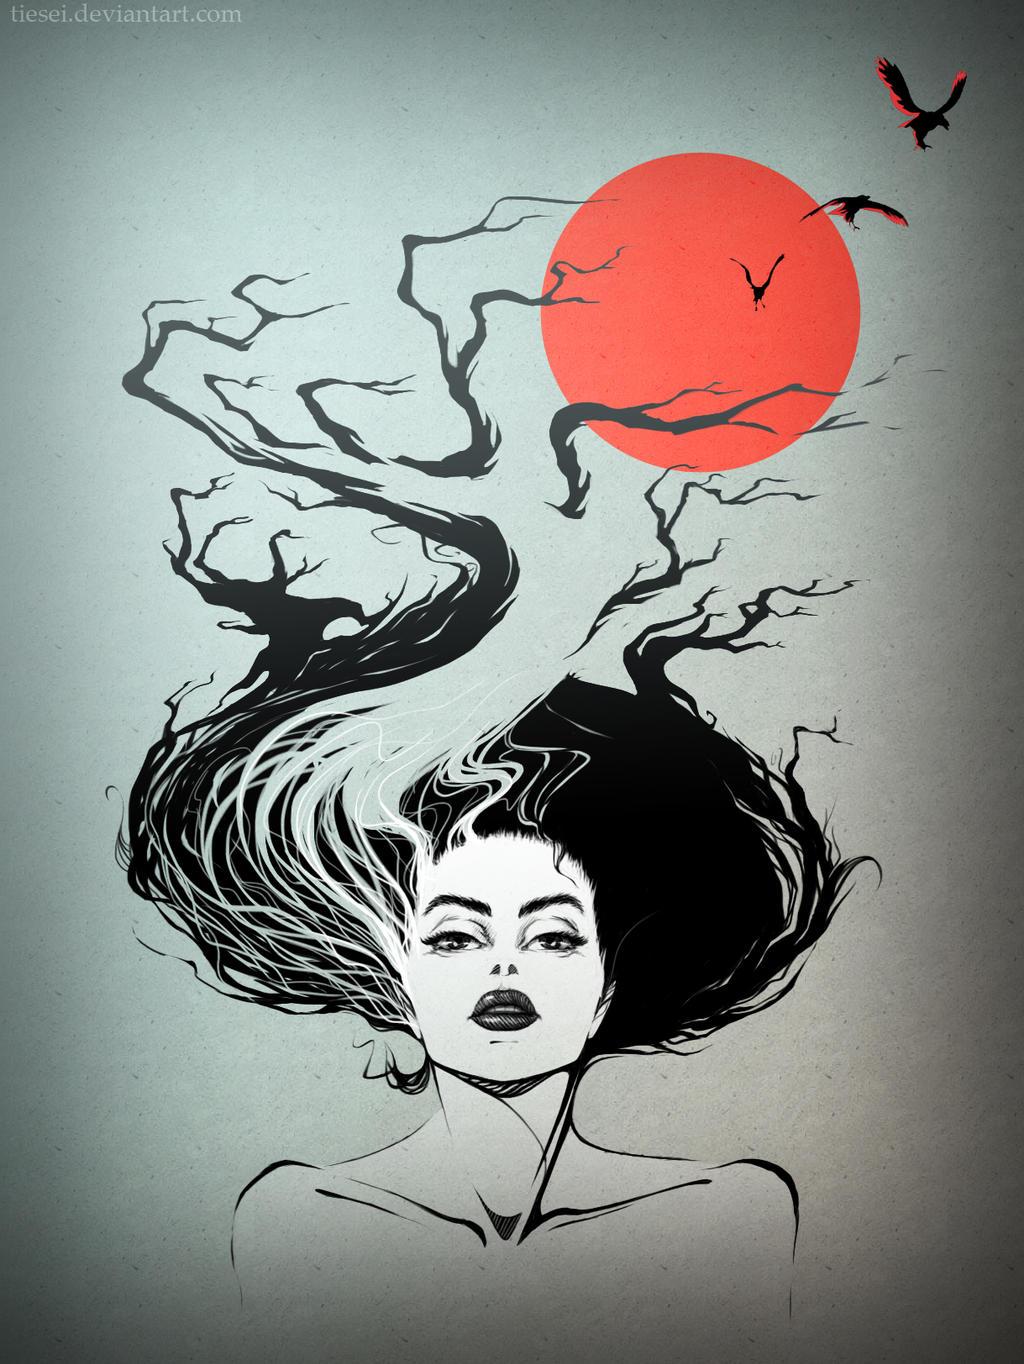 Crows in my head by Tiesei